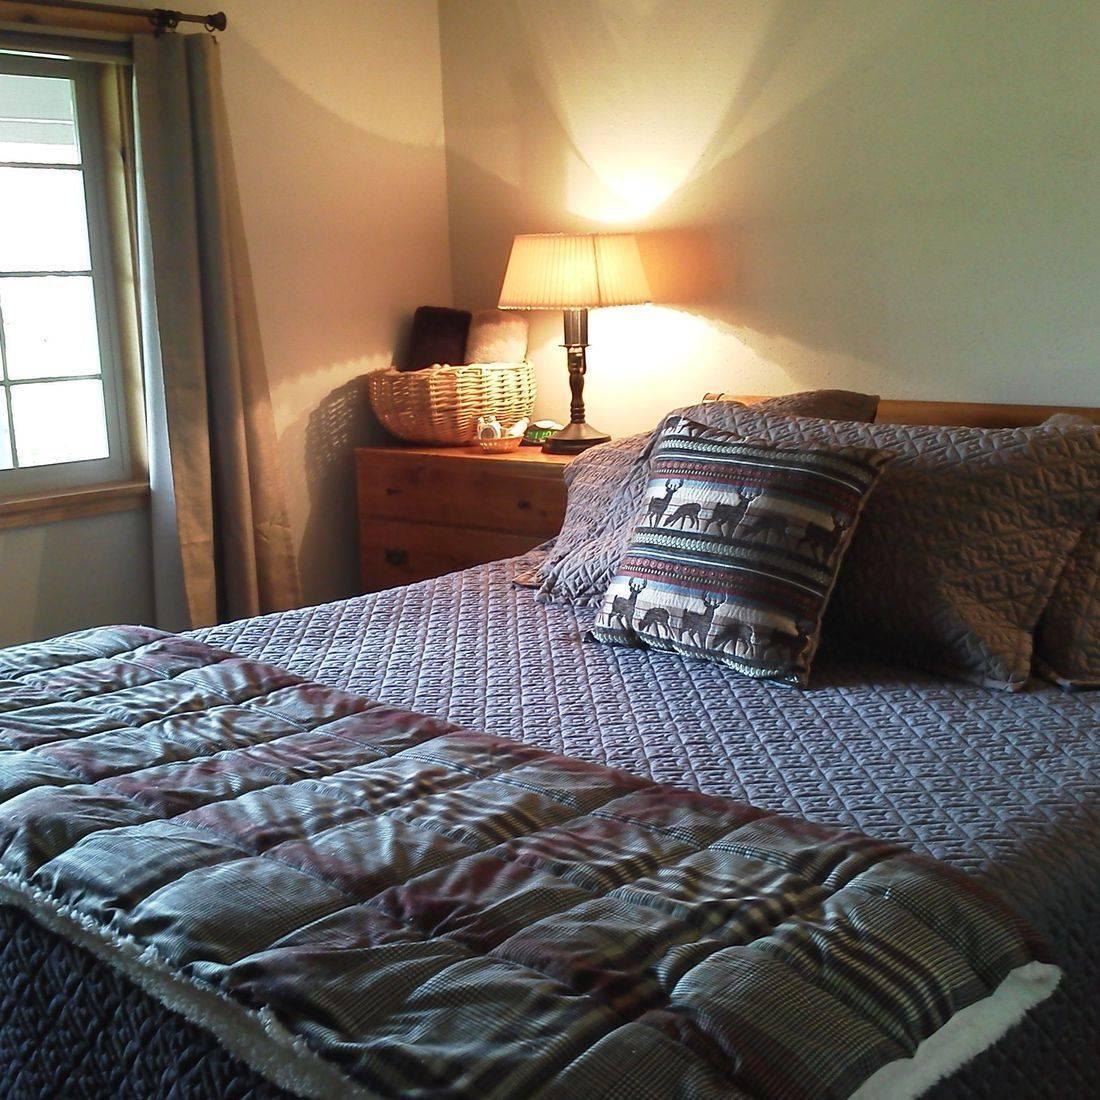 Lodging, guesthouses, Concrete, WA, hotels, North Cascades, Washington